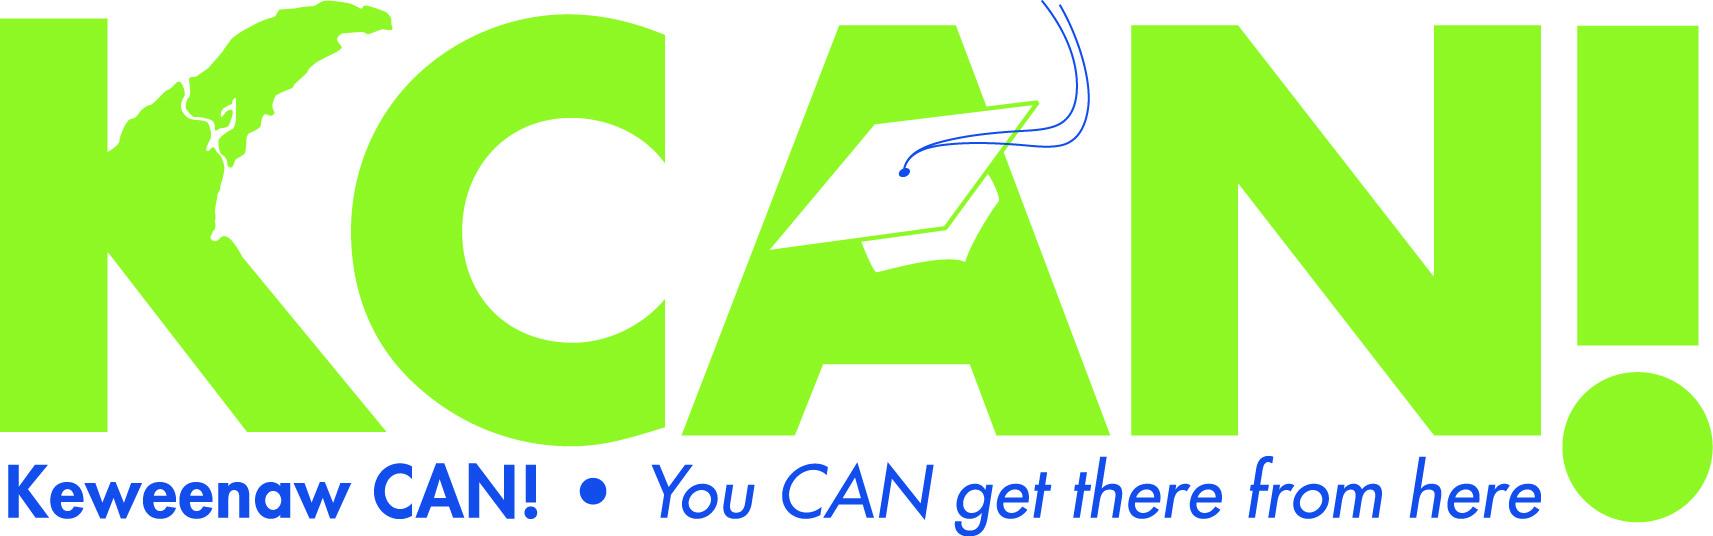 KCAN_logo.jpg